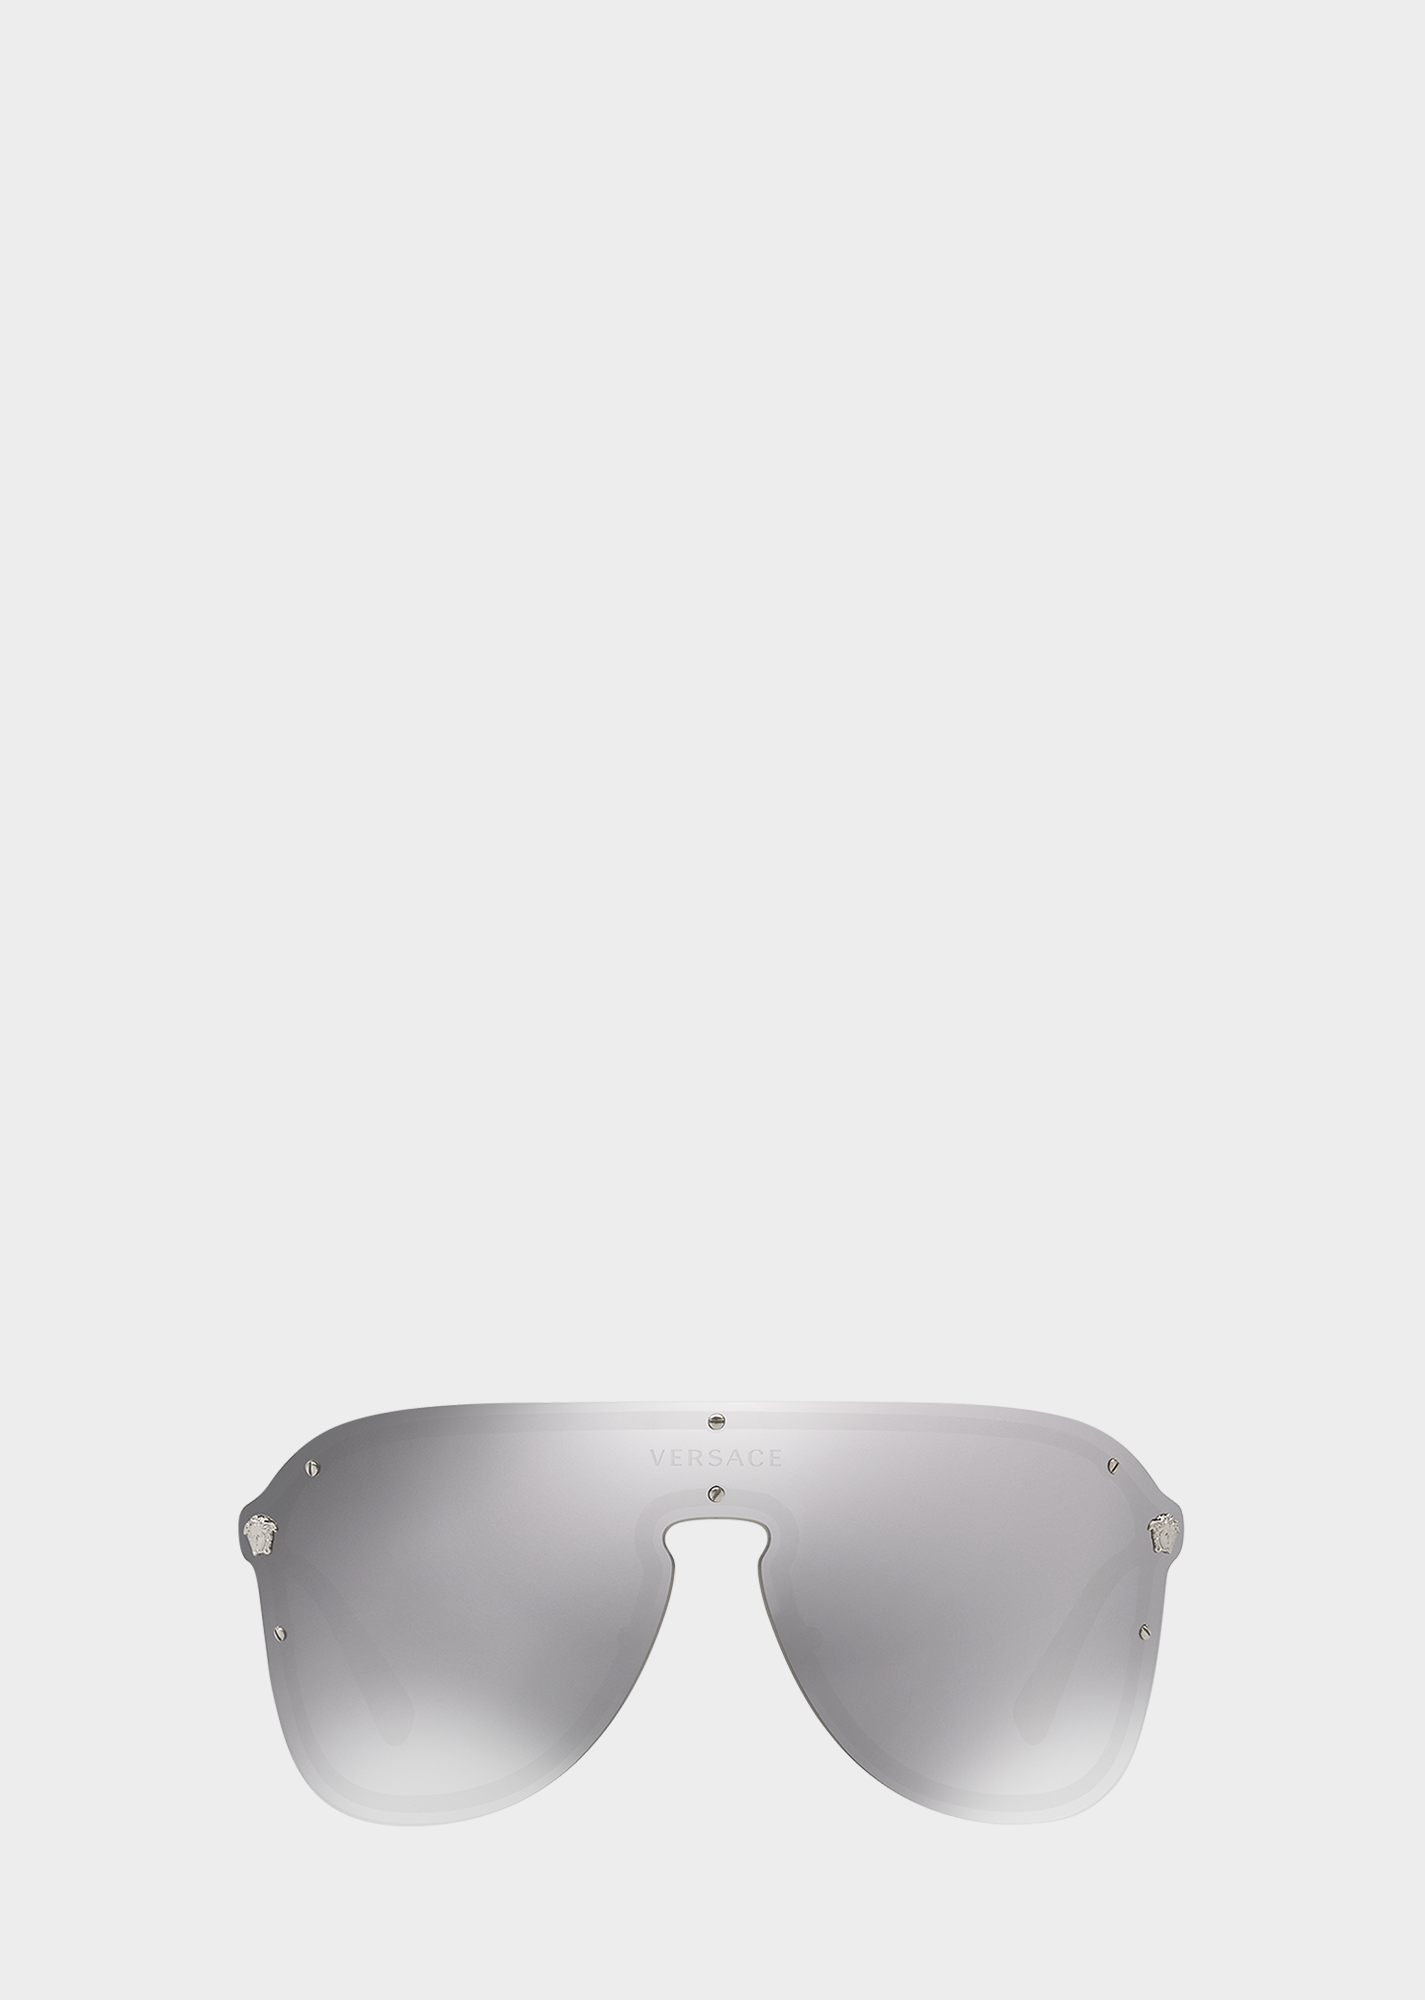 a1bec6e4a03 Silver  Frenergy Visor Sunglasses - ONUL Eyewear